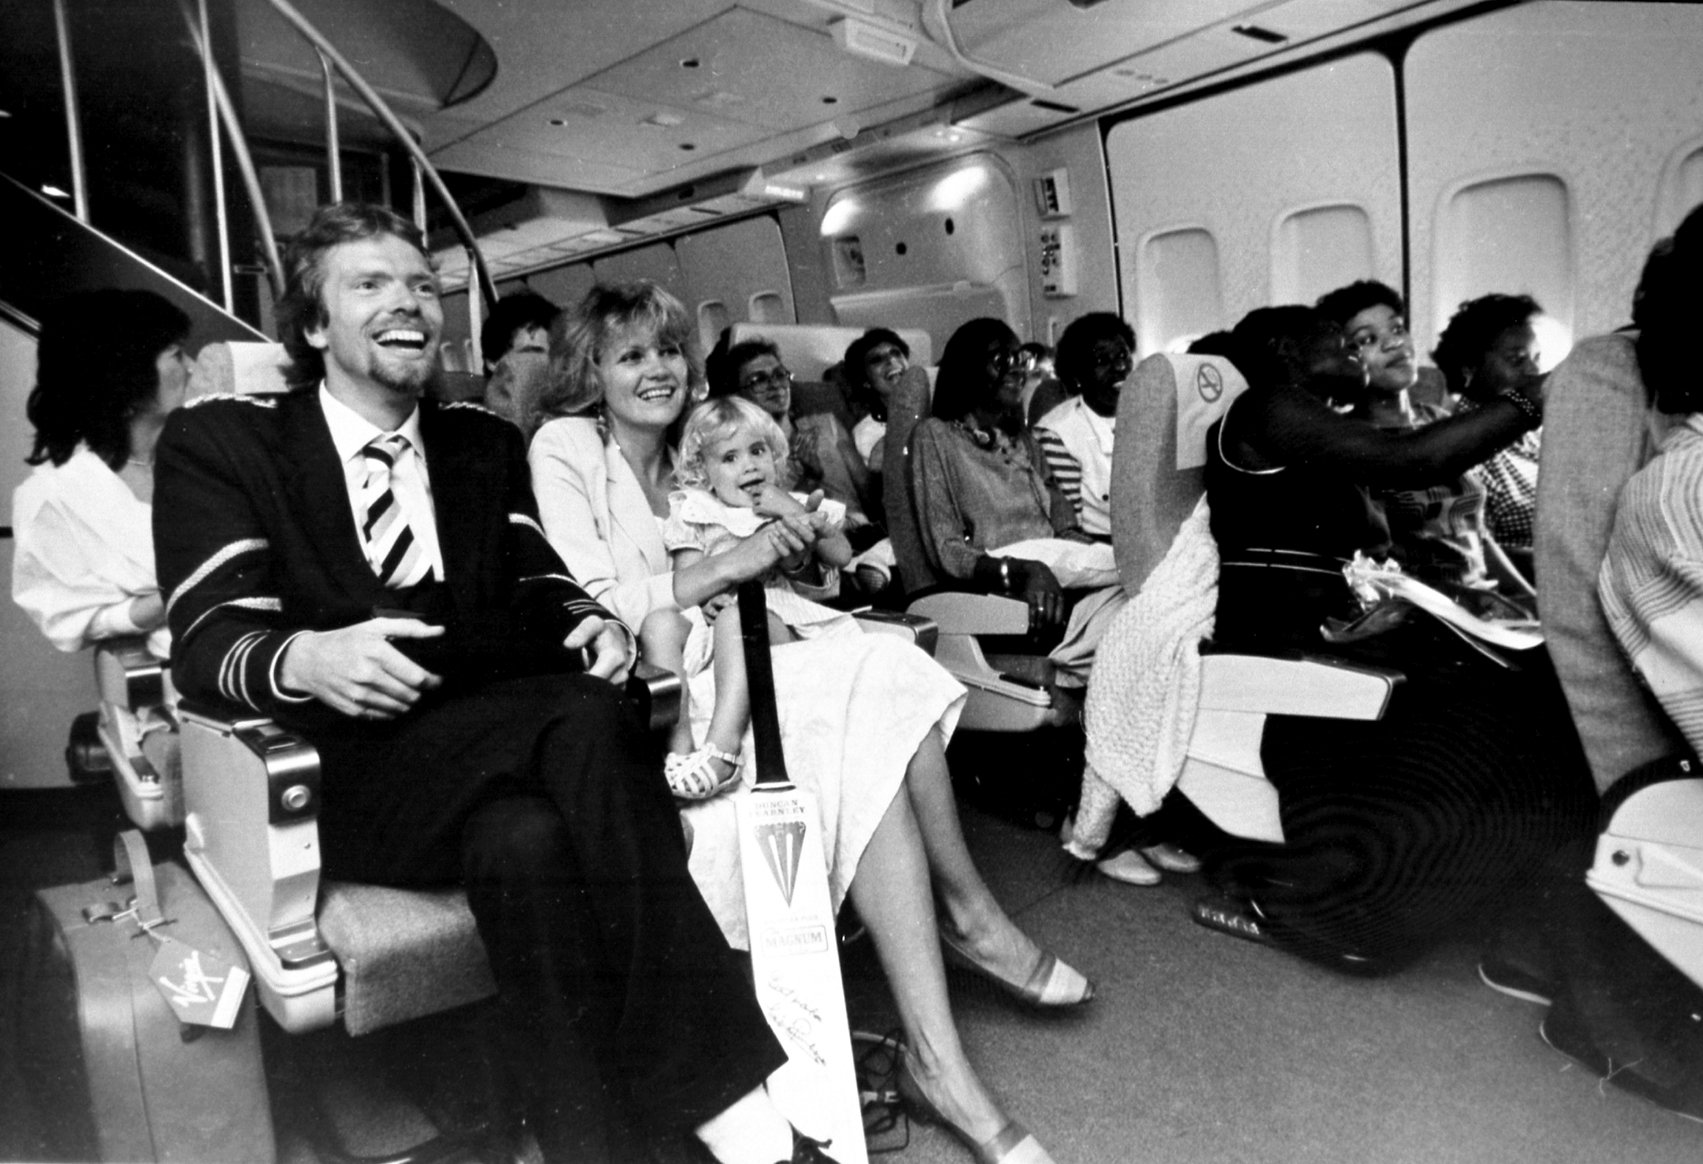 Richard Branson on the Virgin Atlantic inaugural flight from London to New York in 1984